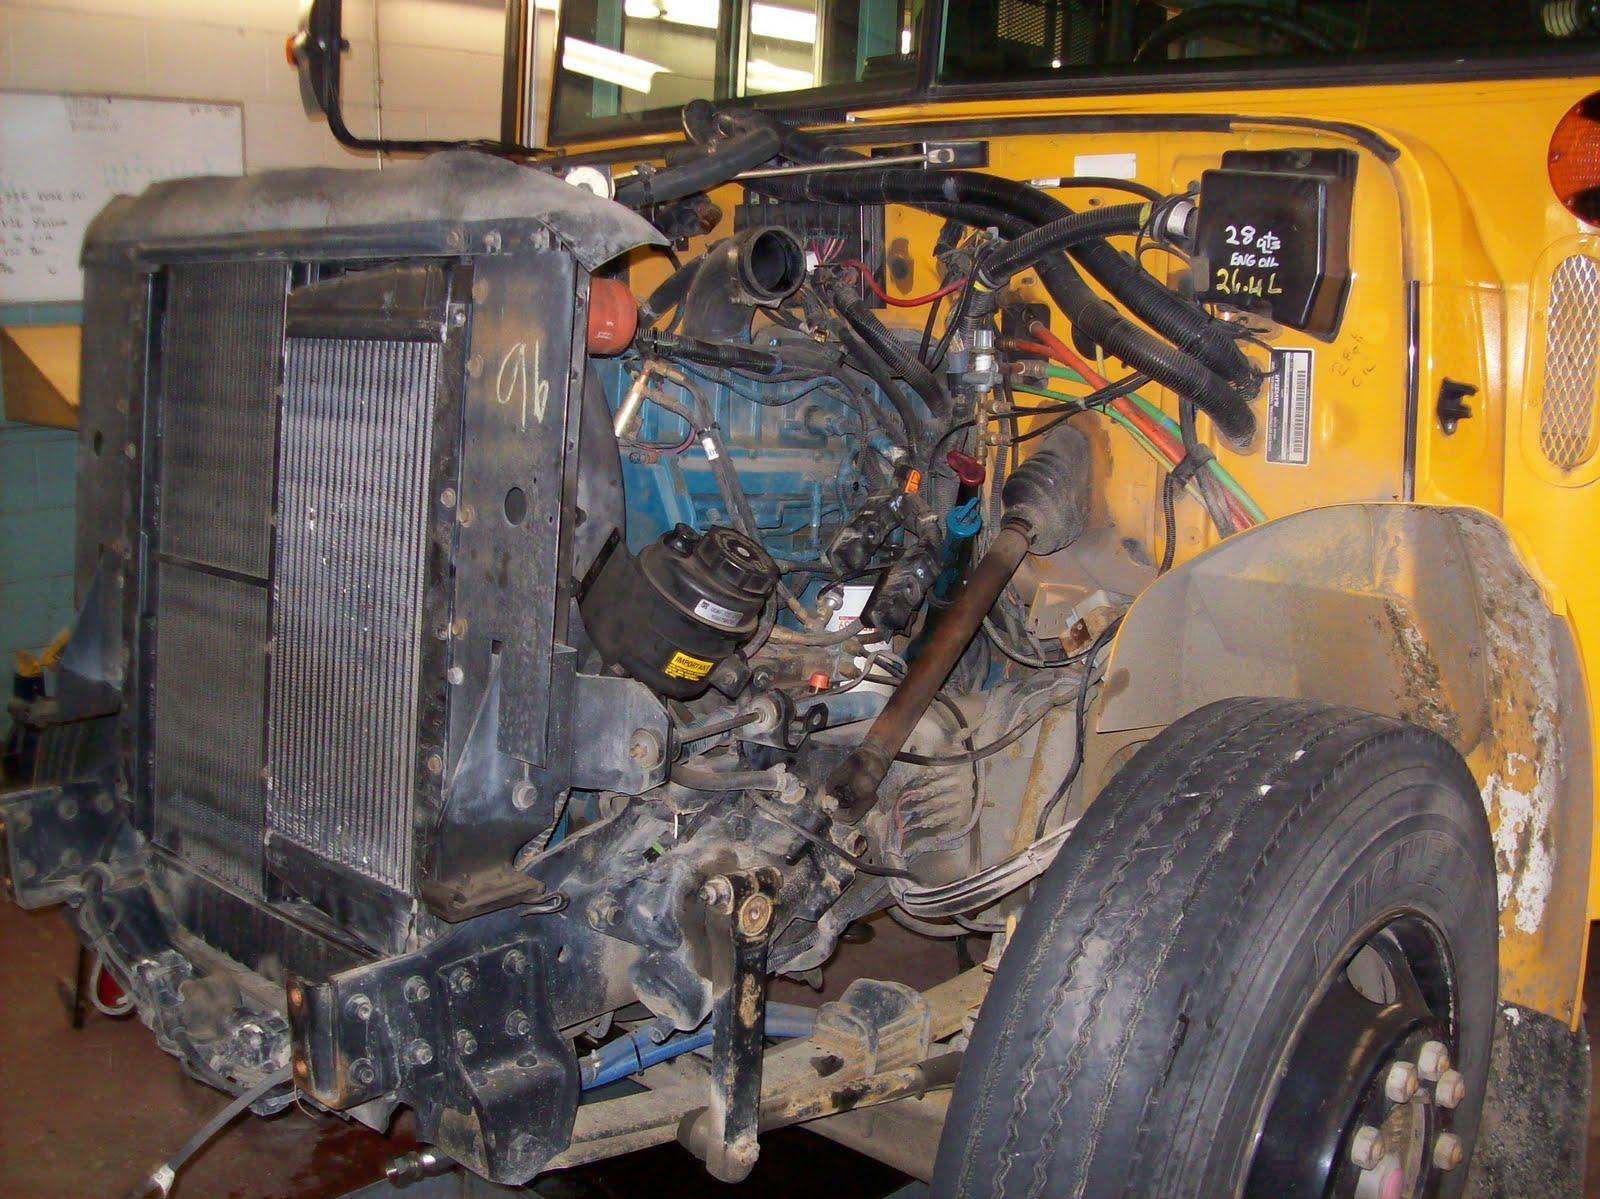 International Dt466 Engine Diagram Wiring For Wall Lights Dt 466 Engines Diagrams Diesel